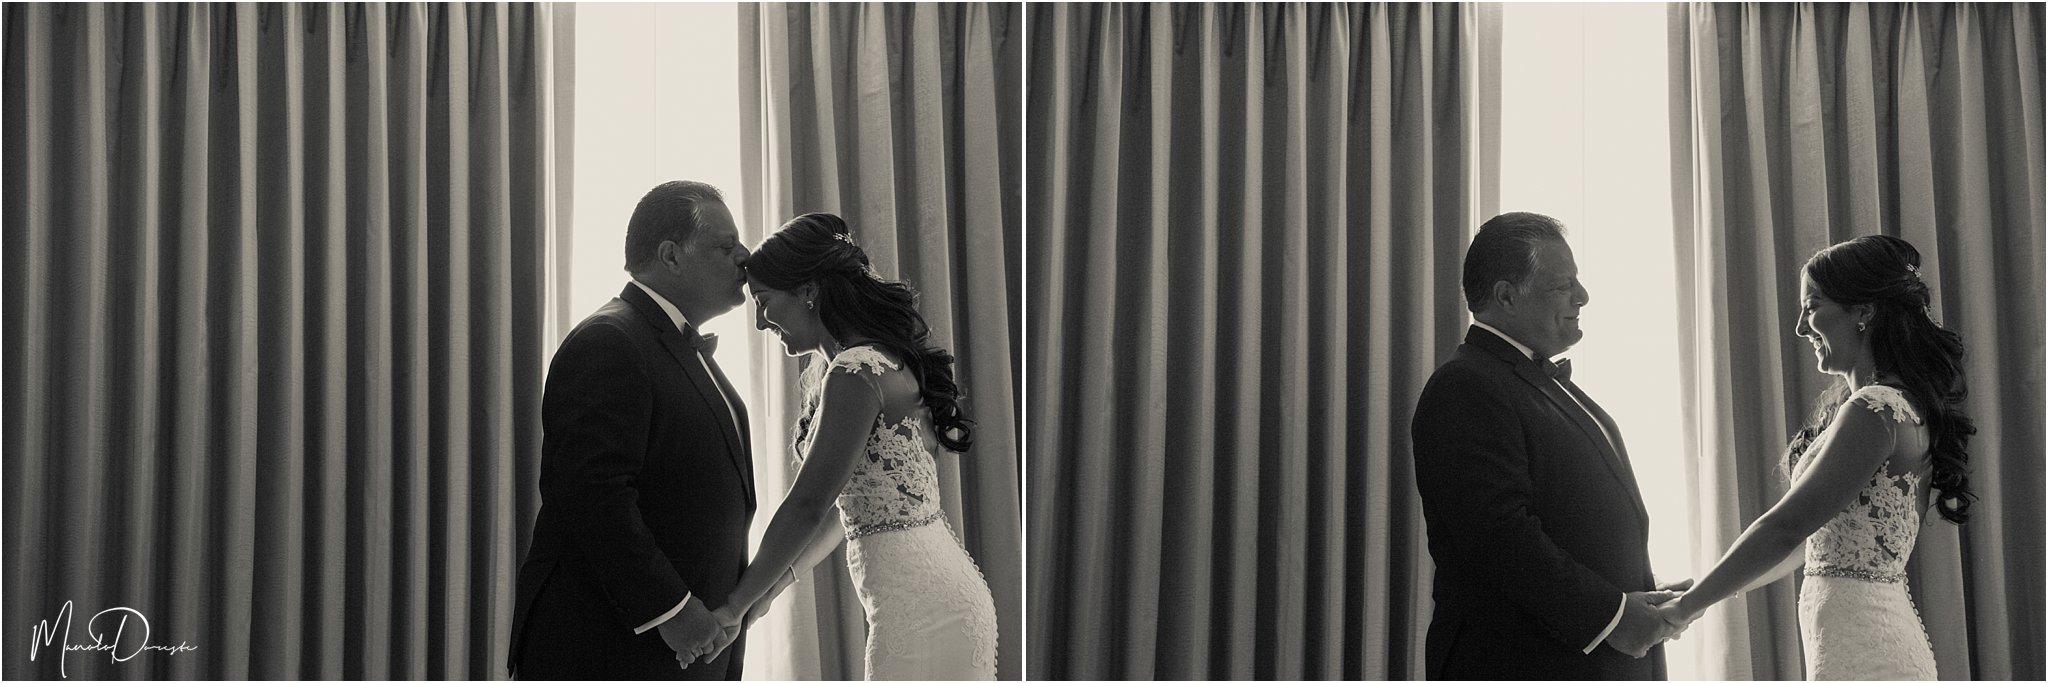 0314_ManoloDoreste_InFocusStudios_Wedding_Family_Photography_Miami_MiamiPhotographer.jpg